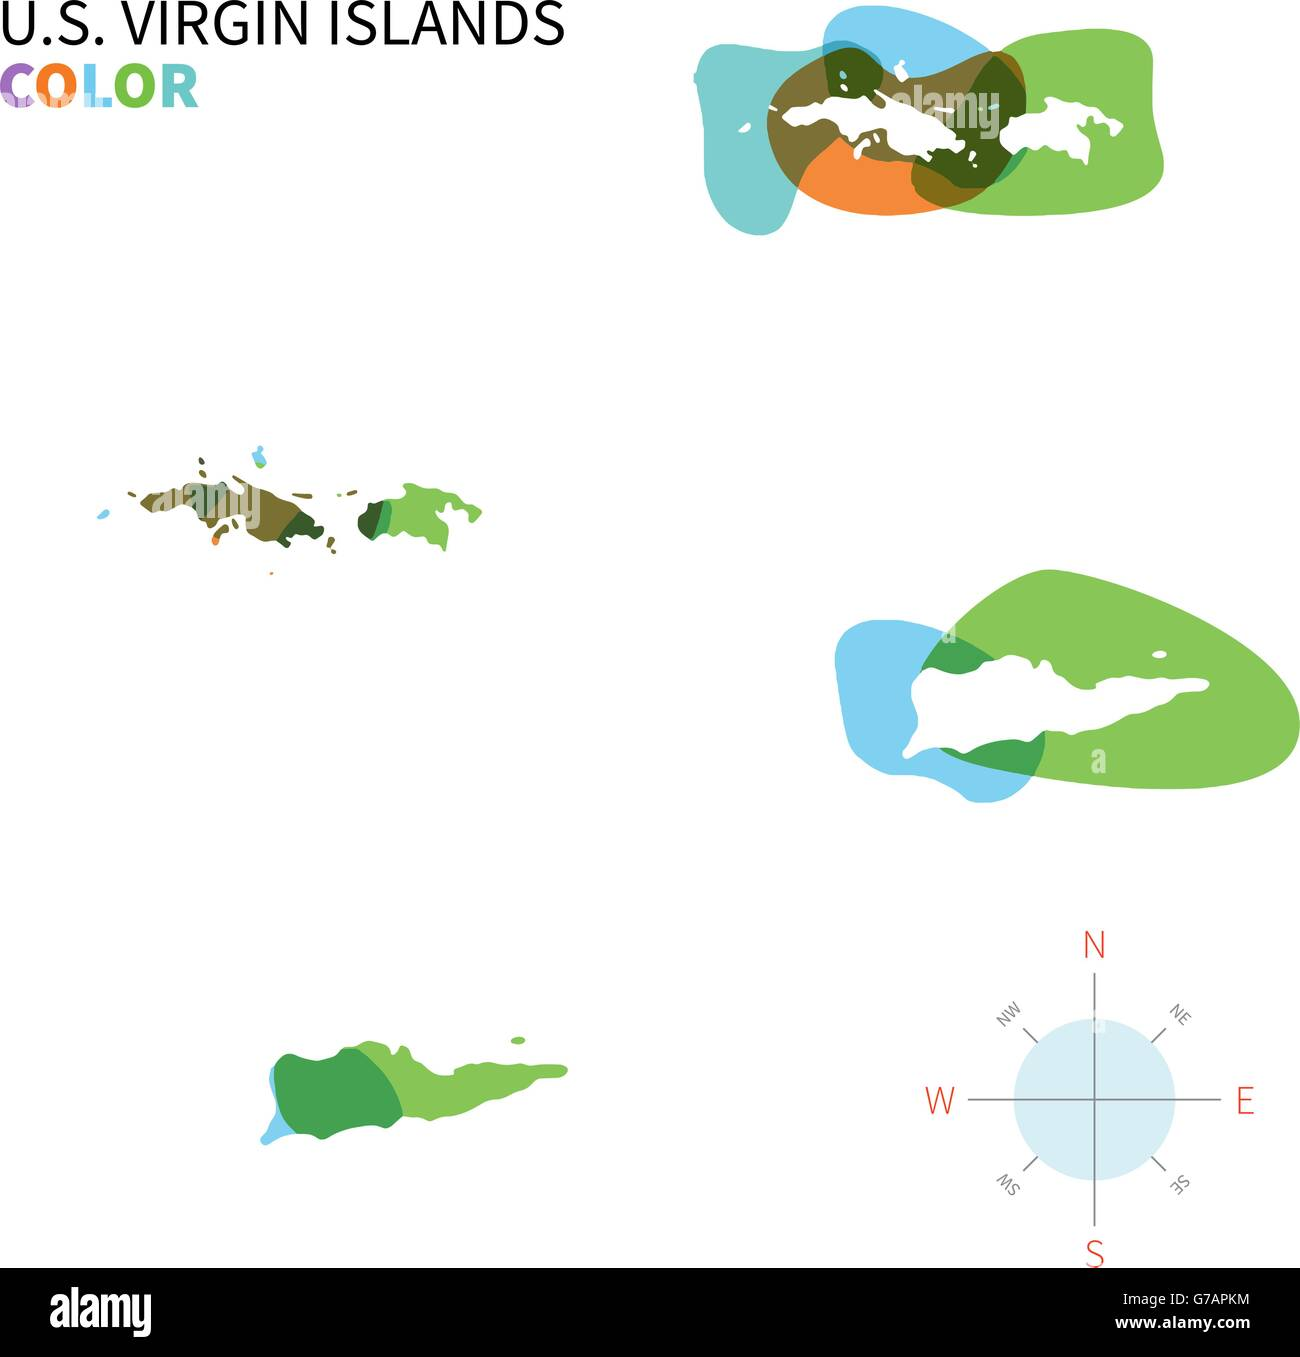 Abstract vector color map of U.S. Virgin Islands Stock Vector Art ...